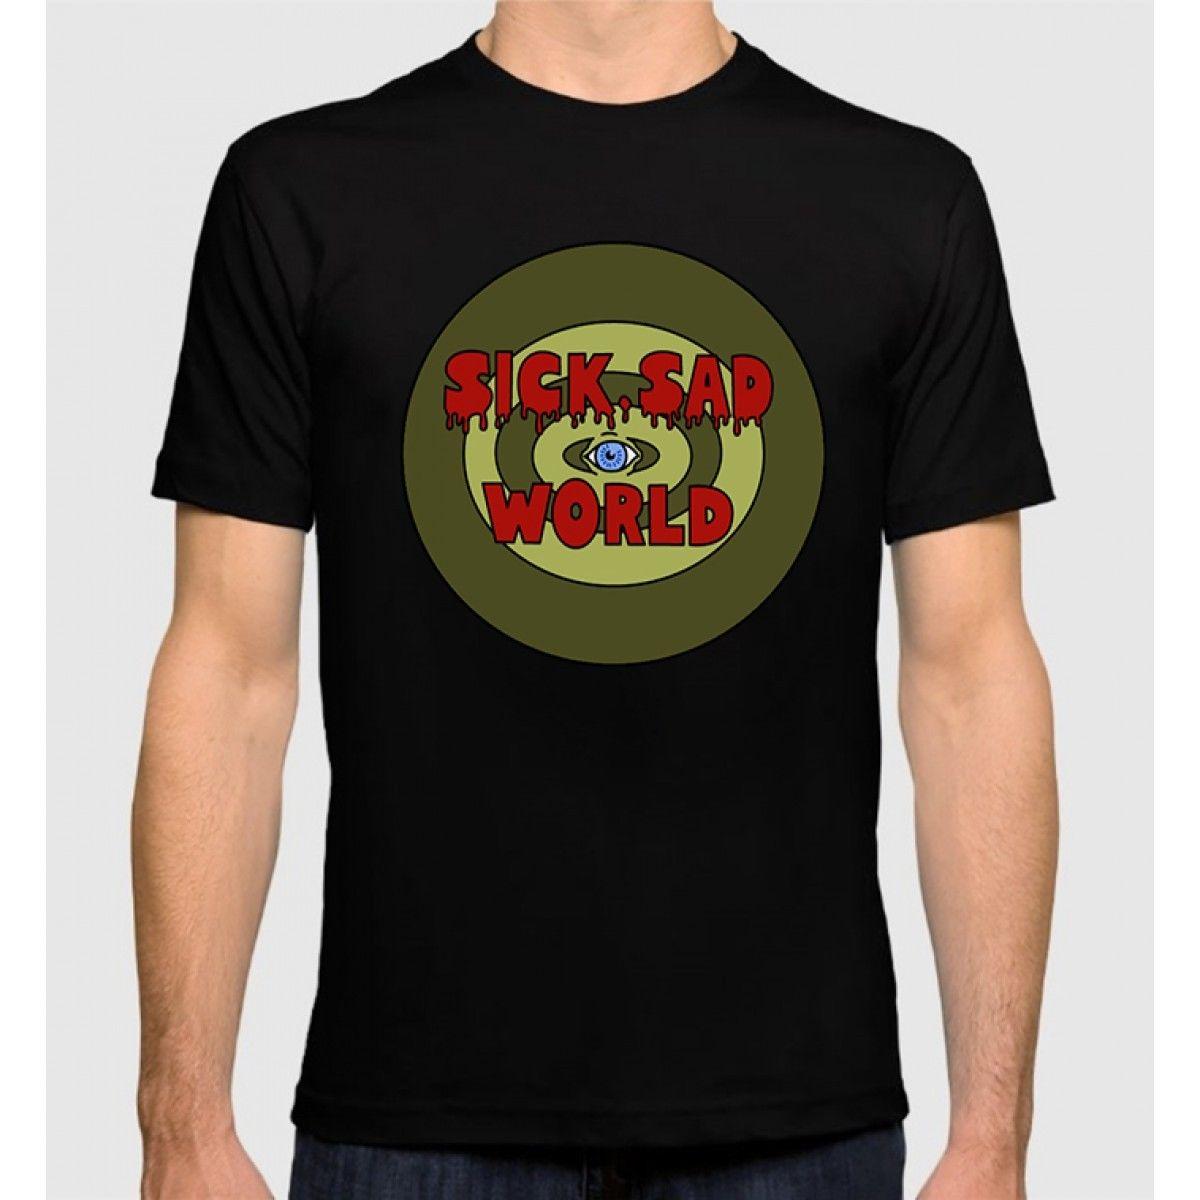 Daria T-shirt Sick Sad World Mens Womens Cotton Tee Round Neck Crazy Top Tee